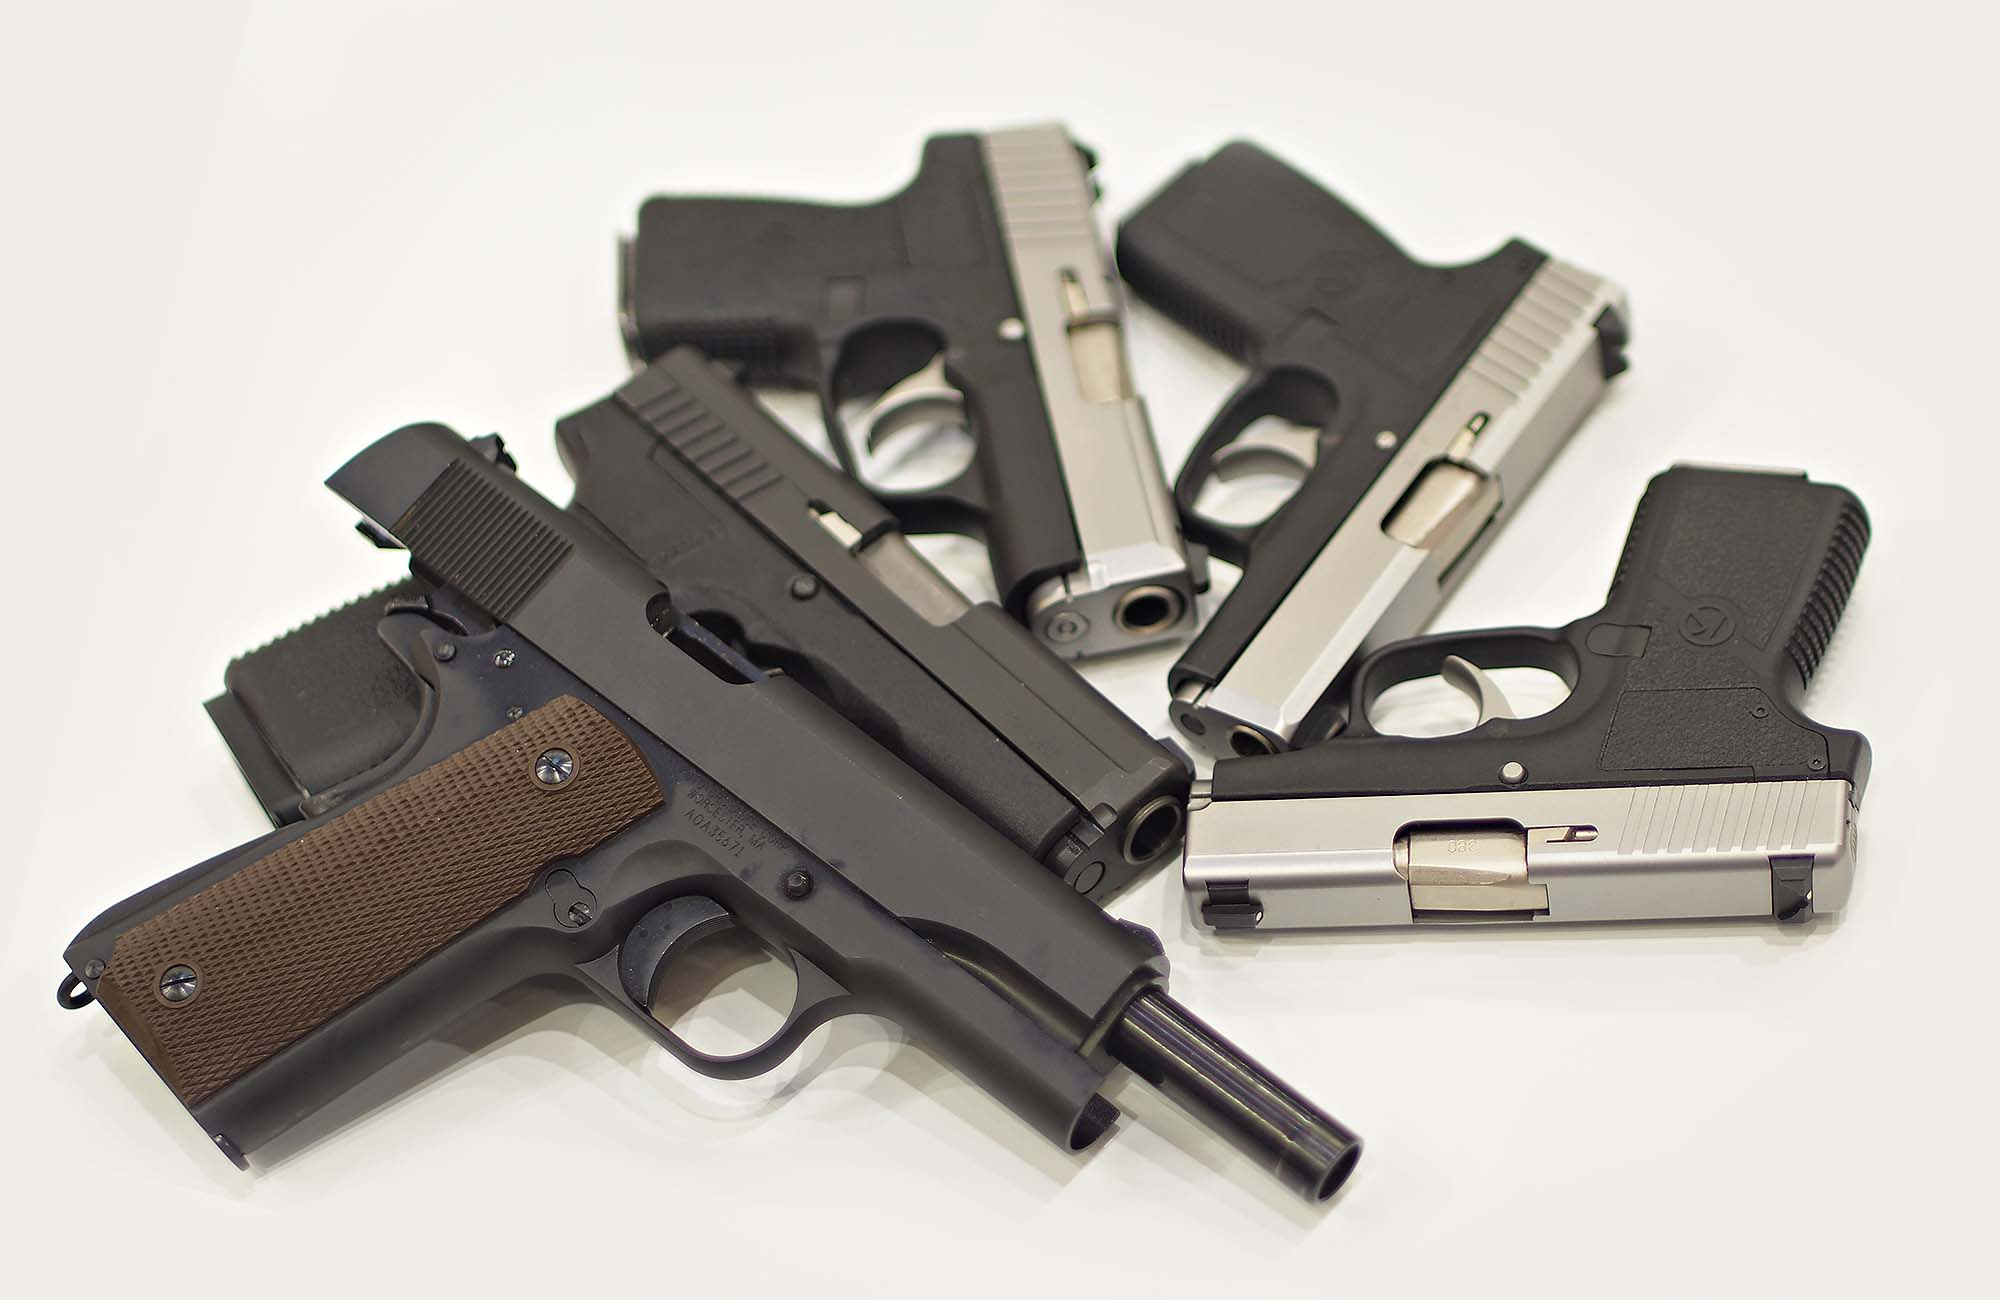 VIDEO: Kahr Arms and Auto Ordnance 2016 new pistols | GUNSweek com